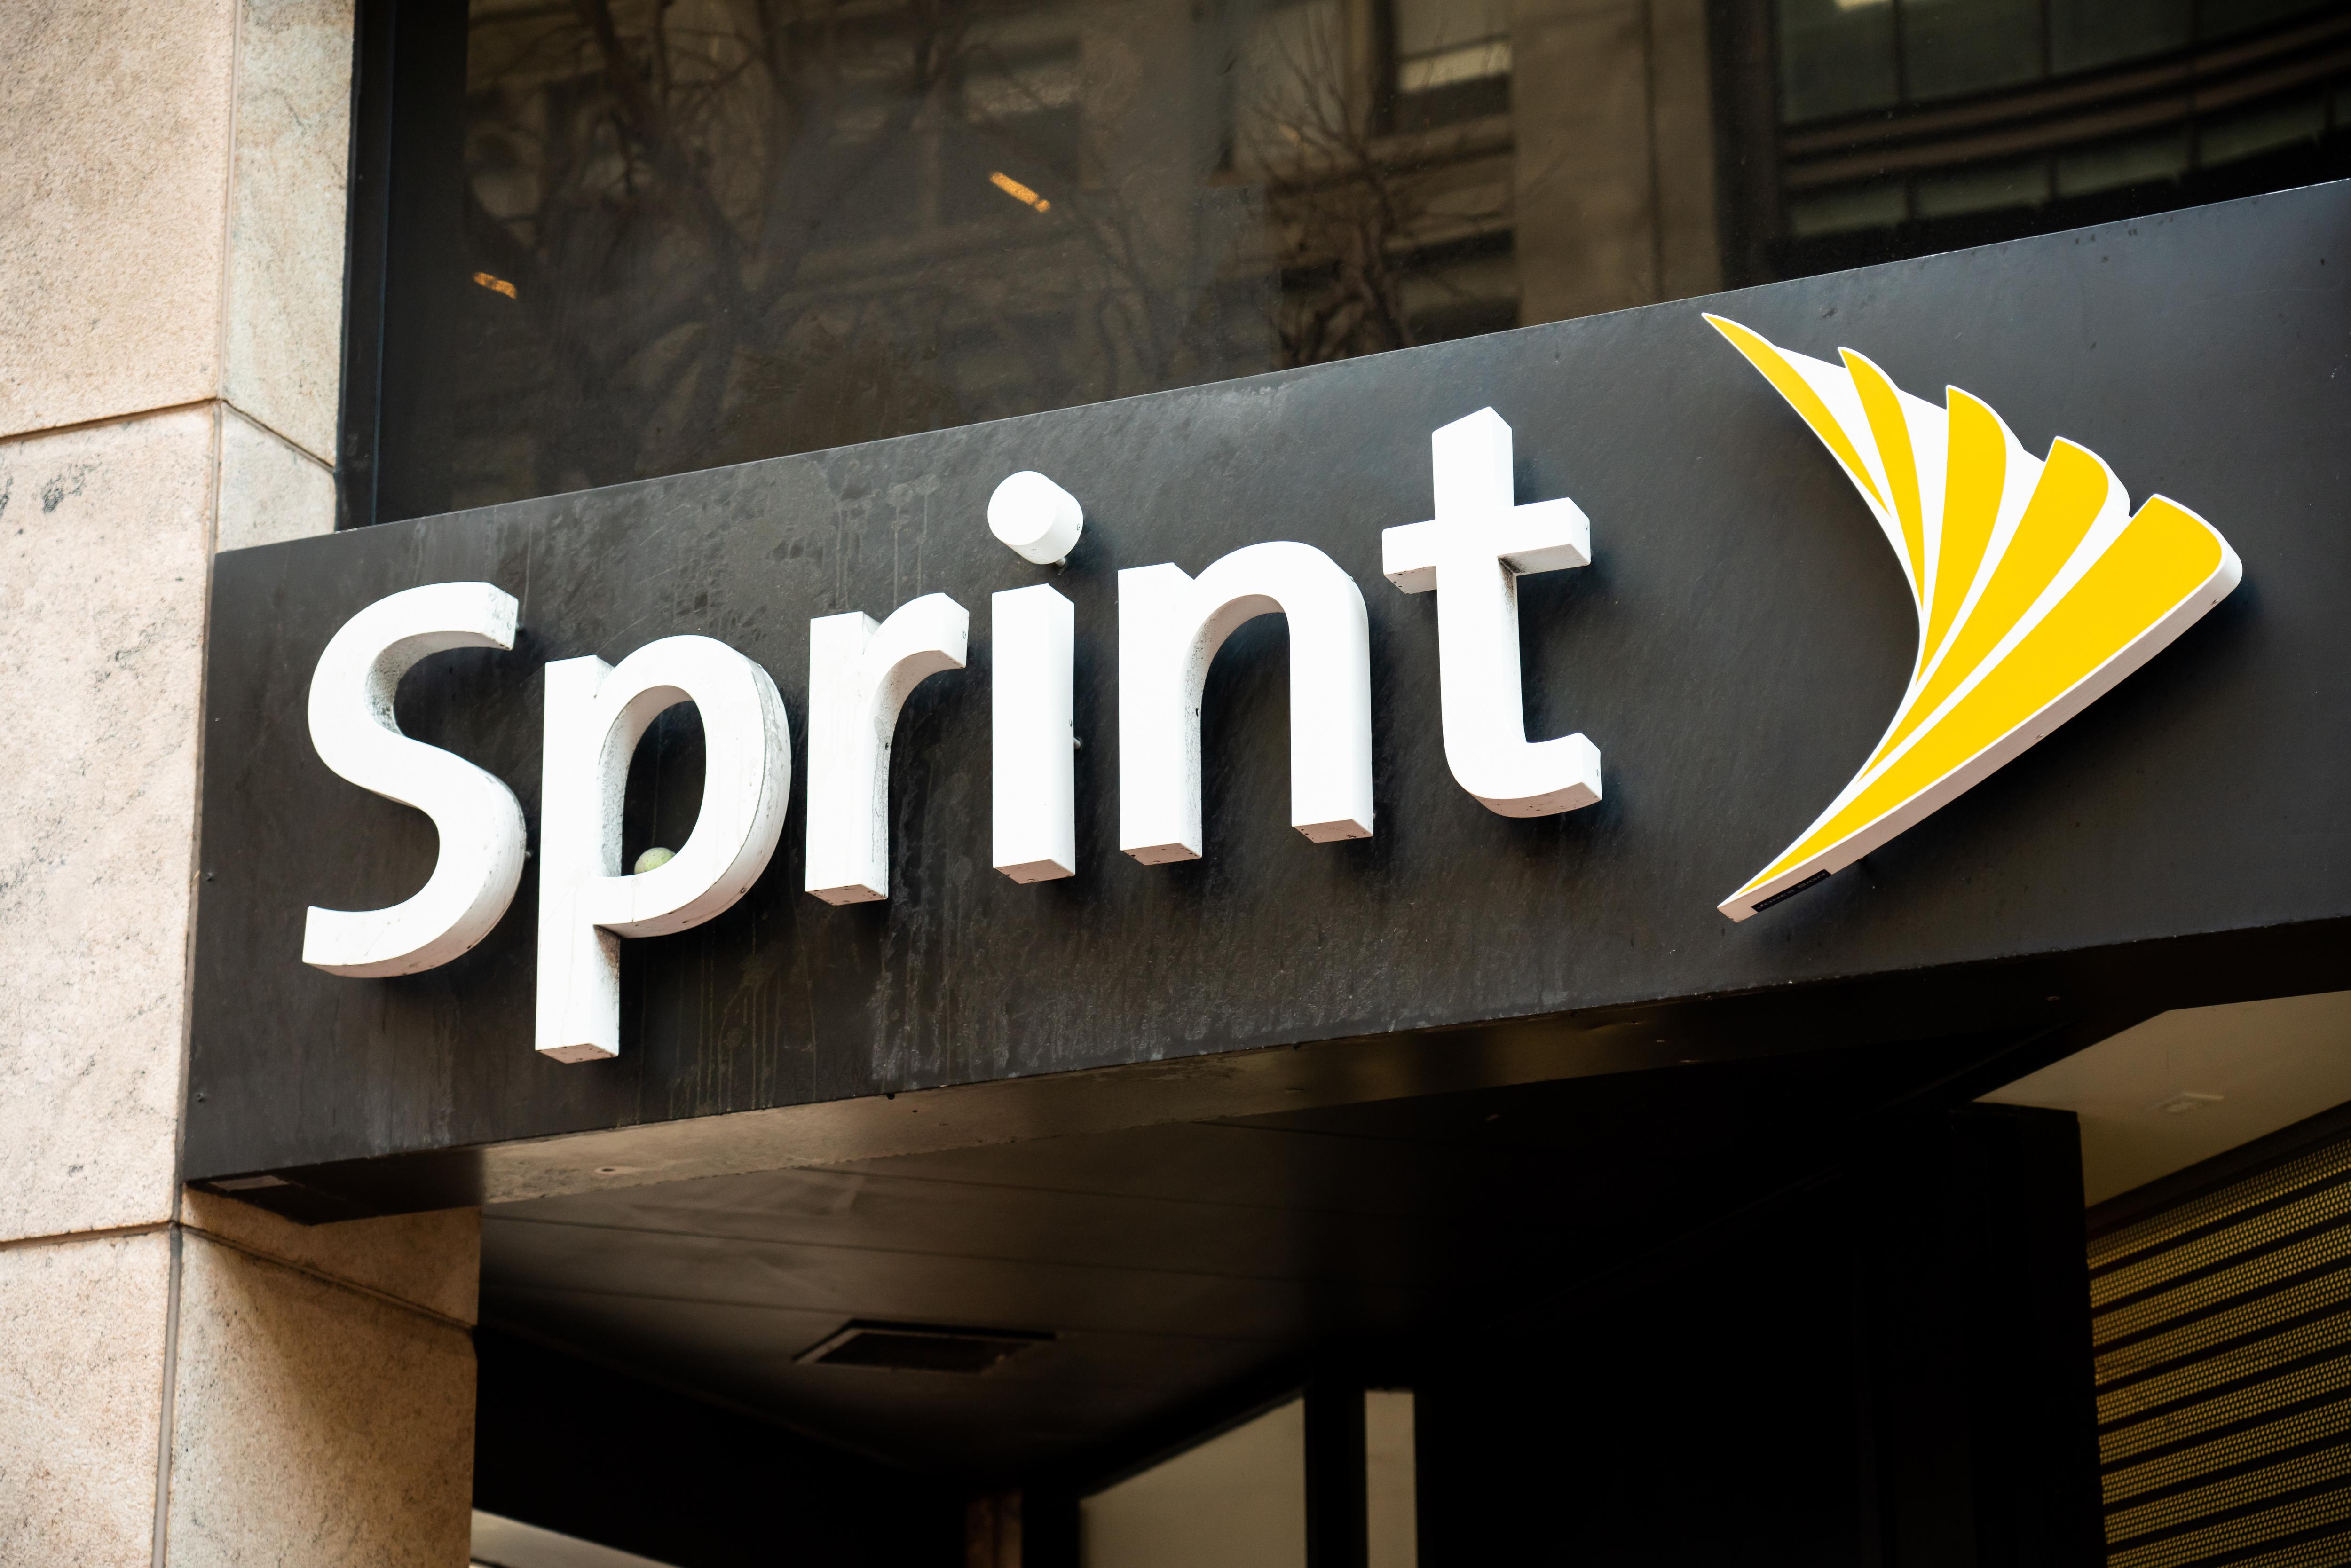 T-Mobile postpones Sprint 3G shutdown to March 31st, 2022